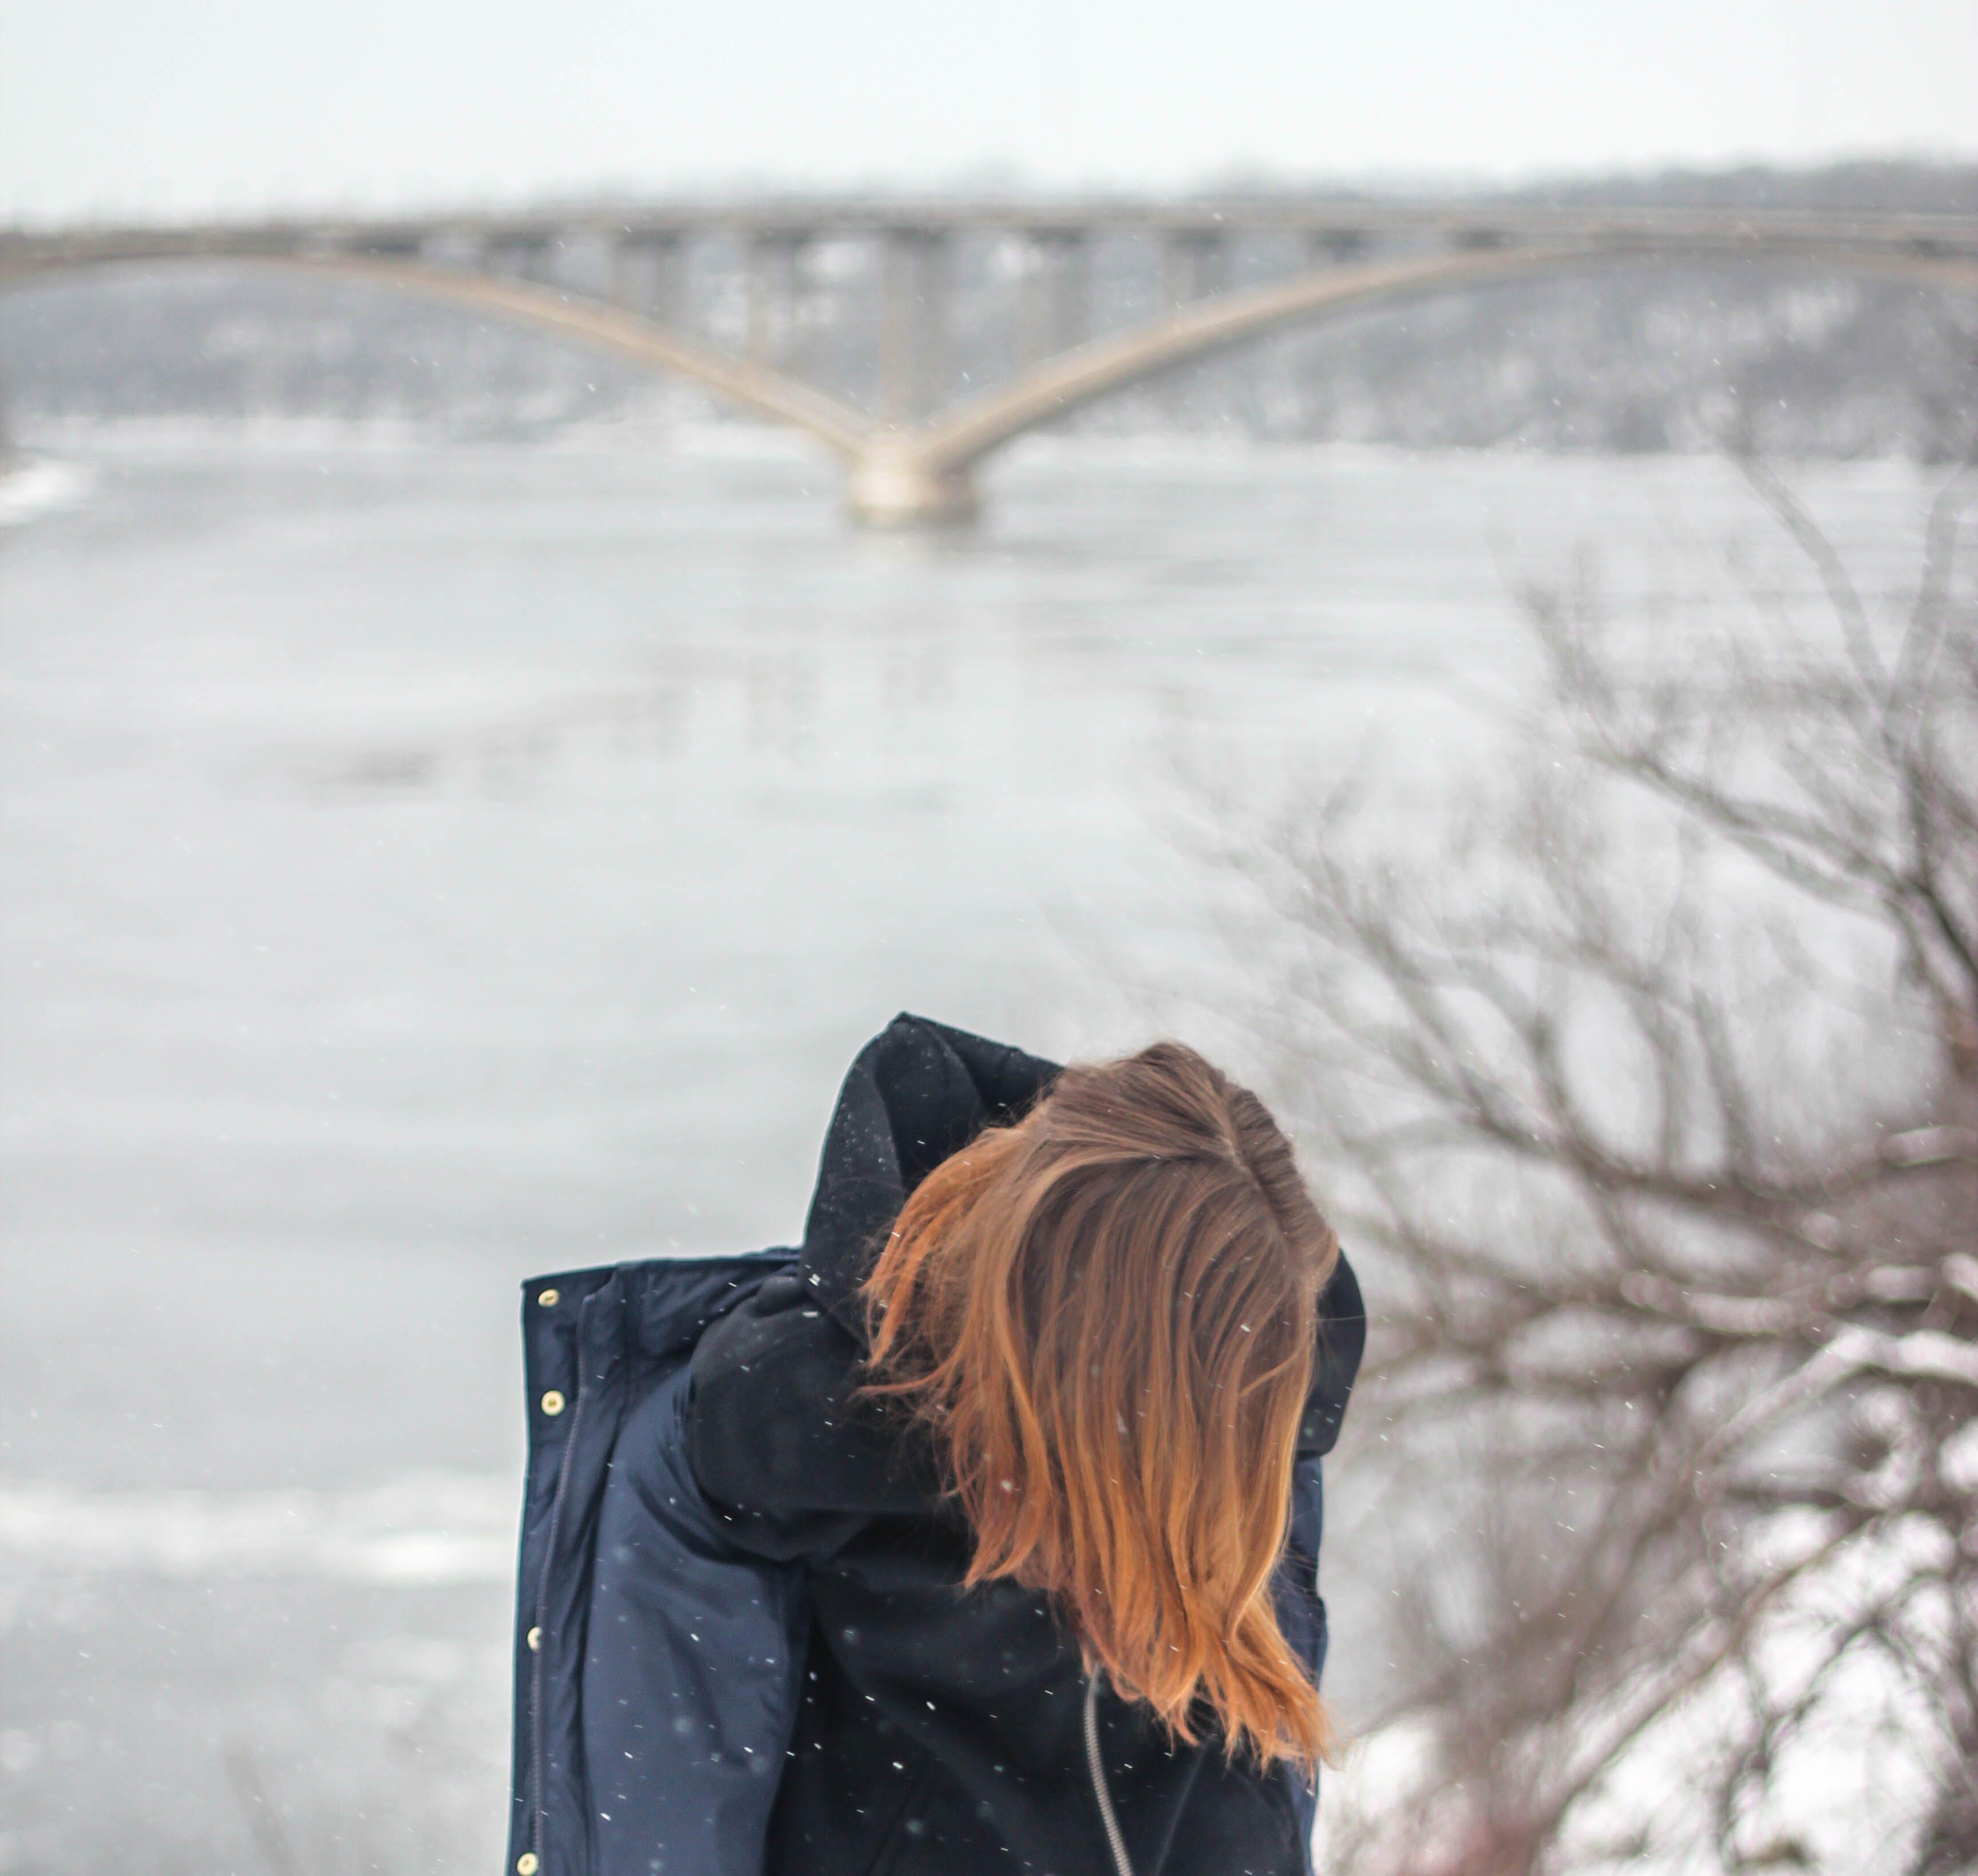 alone, blur, bridge